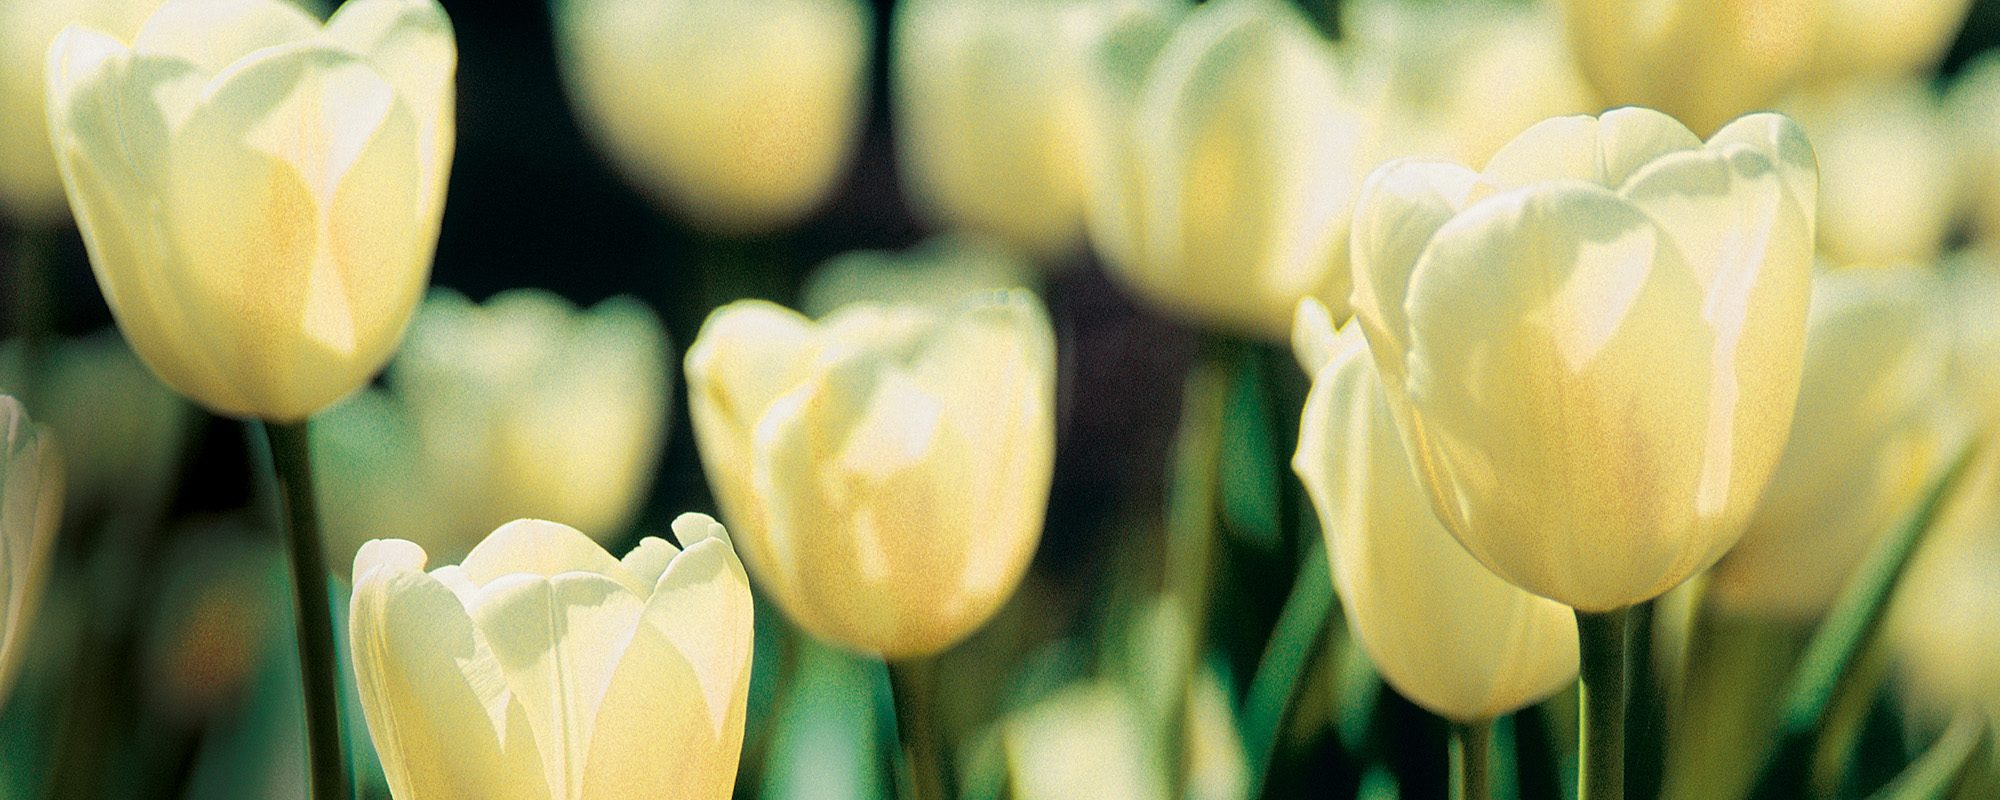 Tulpenfeld, nah, weisse Blueten